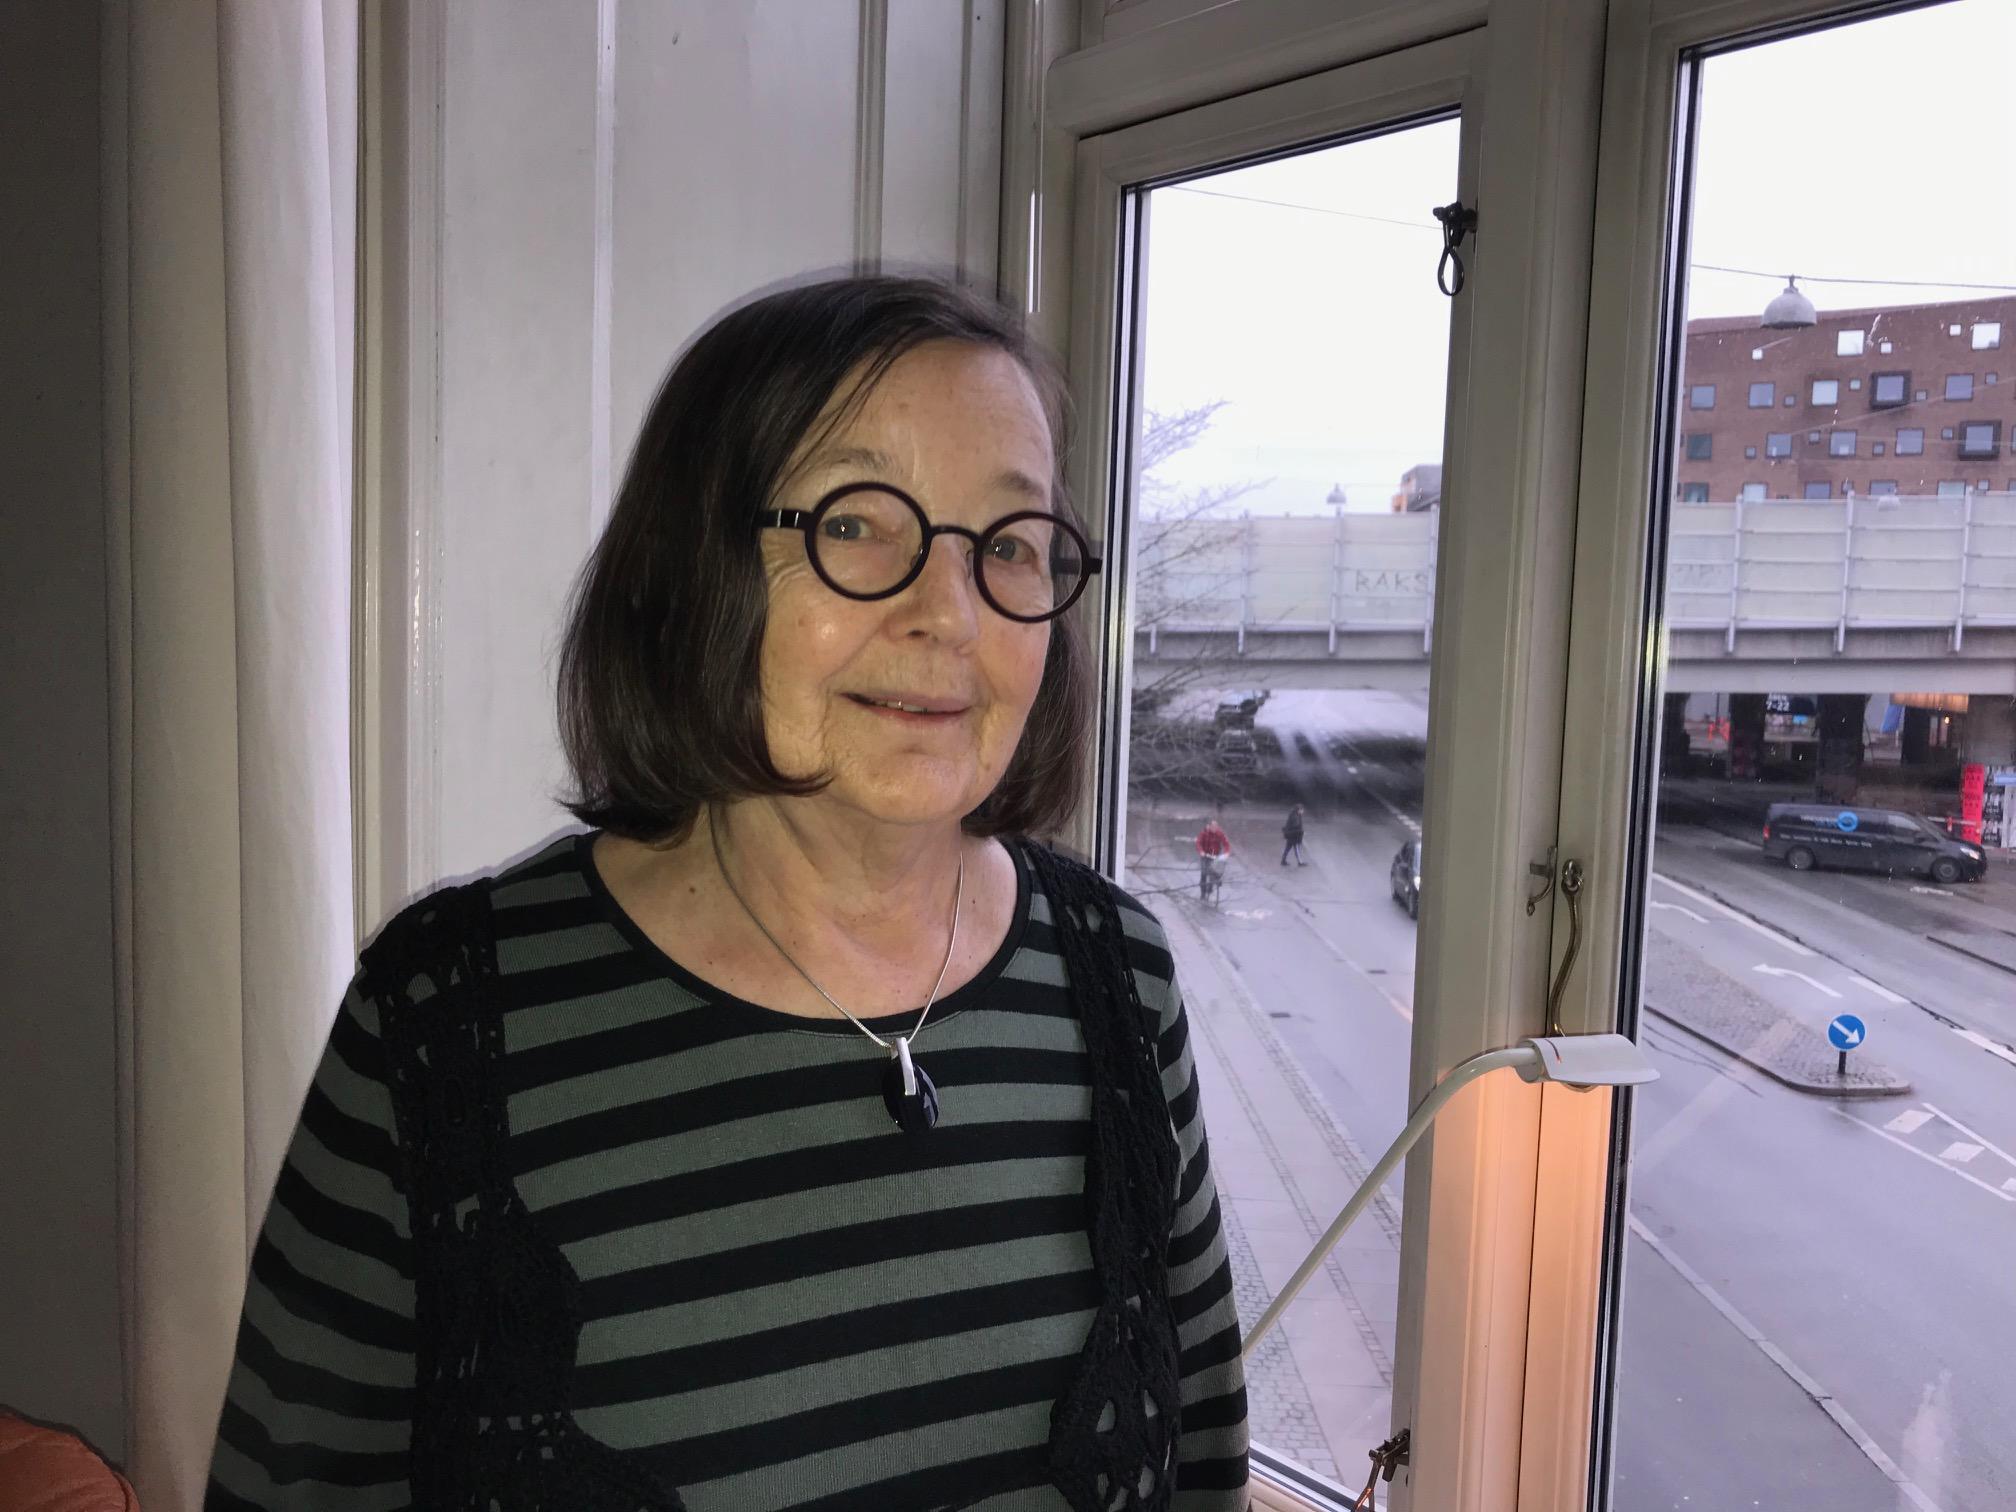 Solveig Ellegaard Poulsen